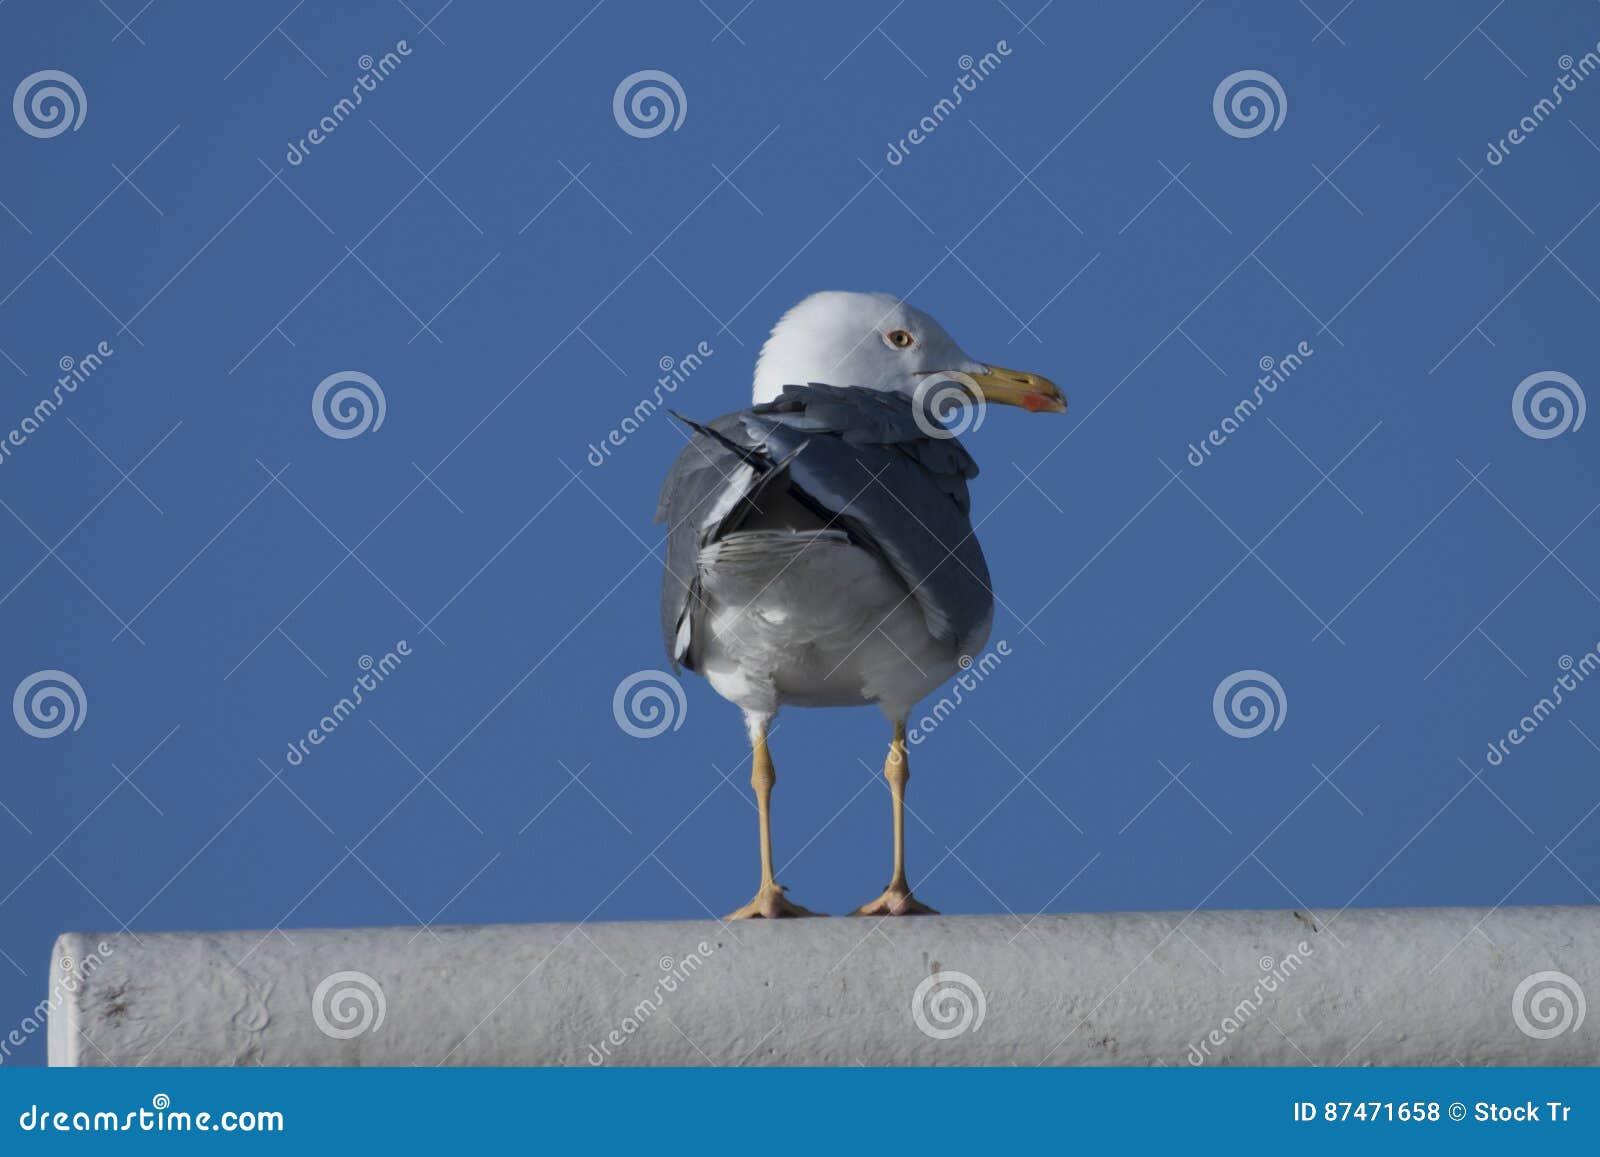 Gaviota en vuelo